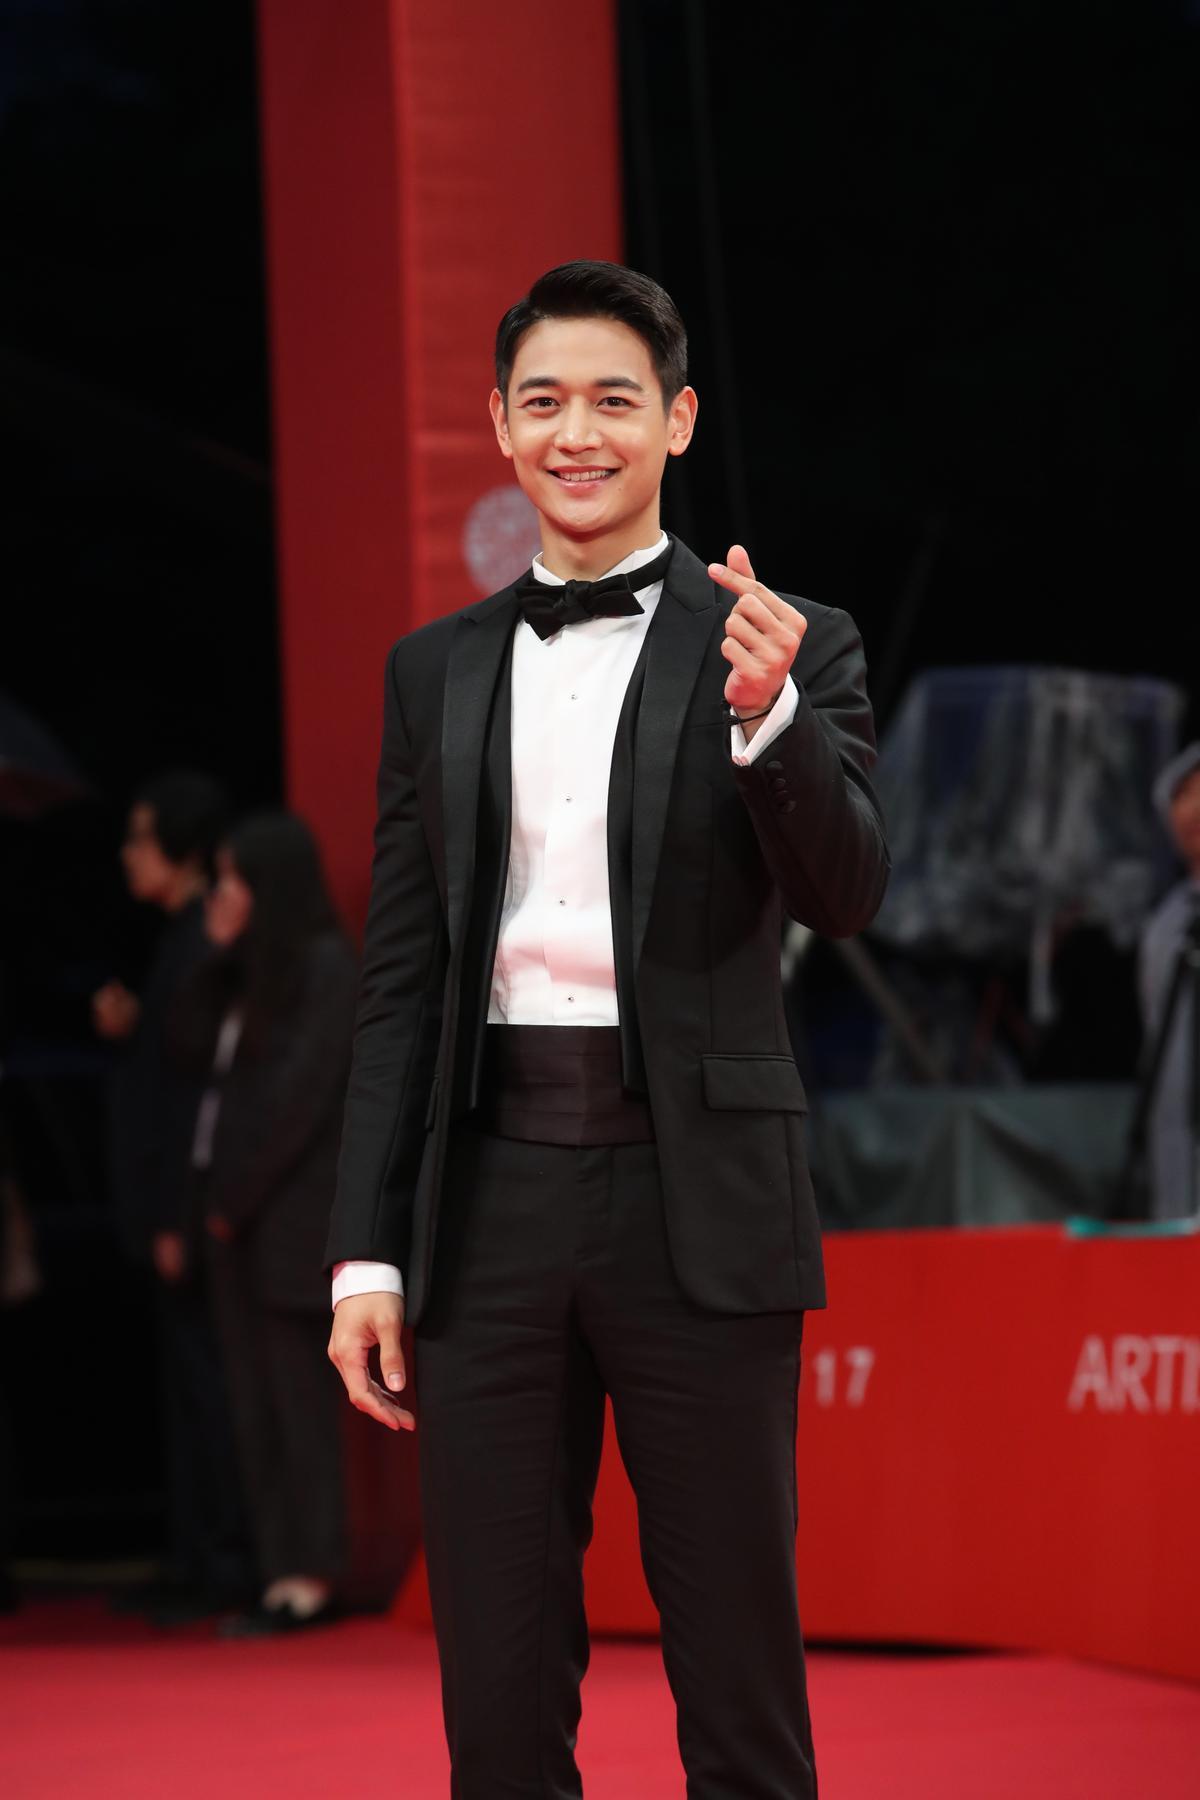 SHINee珉豪出席釜山影展開幕,黑色西裝盡顯帥氣。(東方IC)